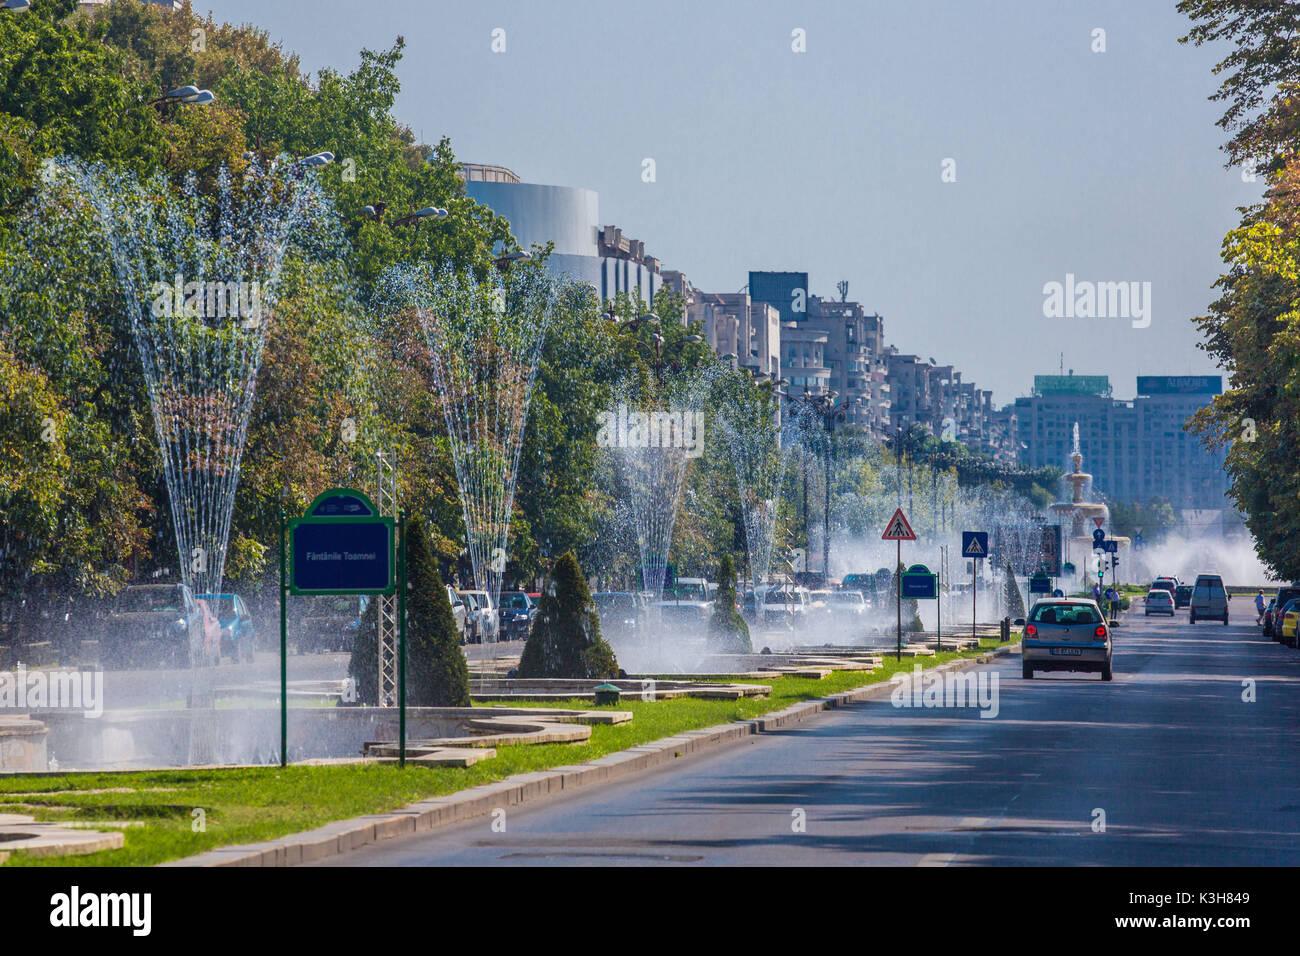 Romania, Bucharest City, Unirii Boulevard Stock Photo